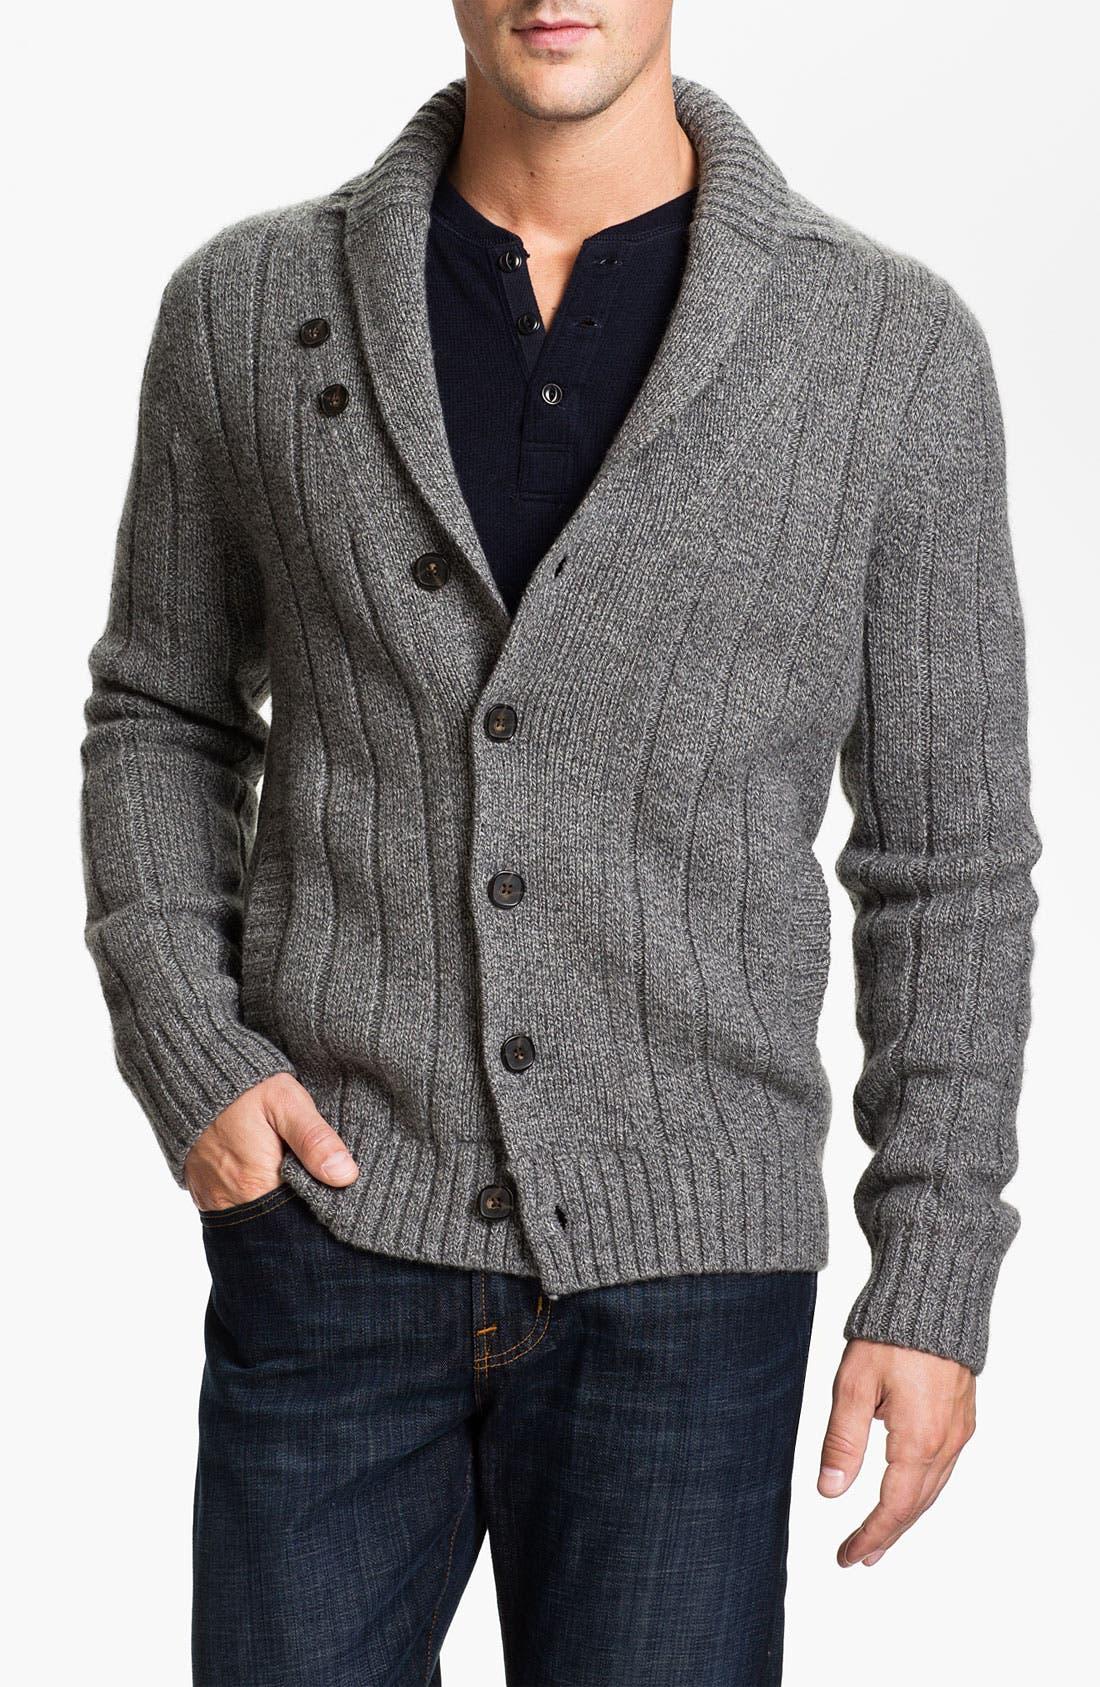 Main Image - Façonnable Tailored Denim Shawl Collar Merino Wool Cardigan